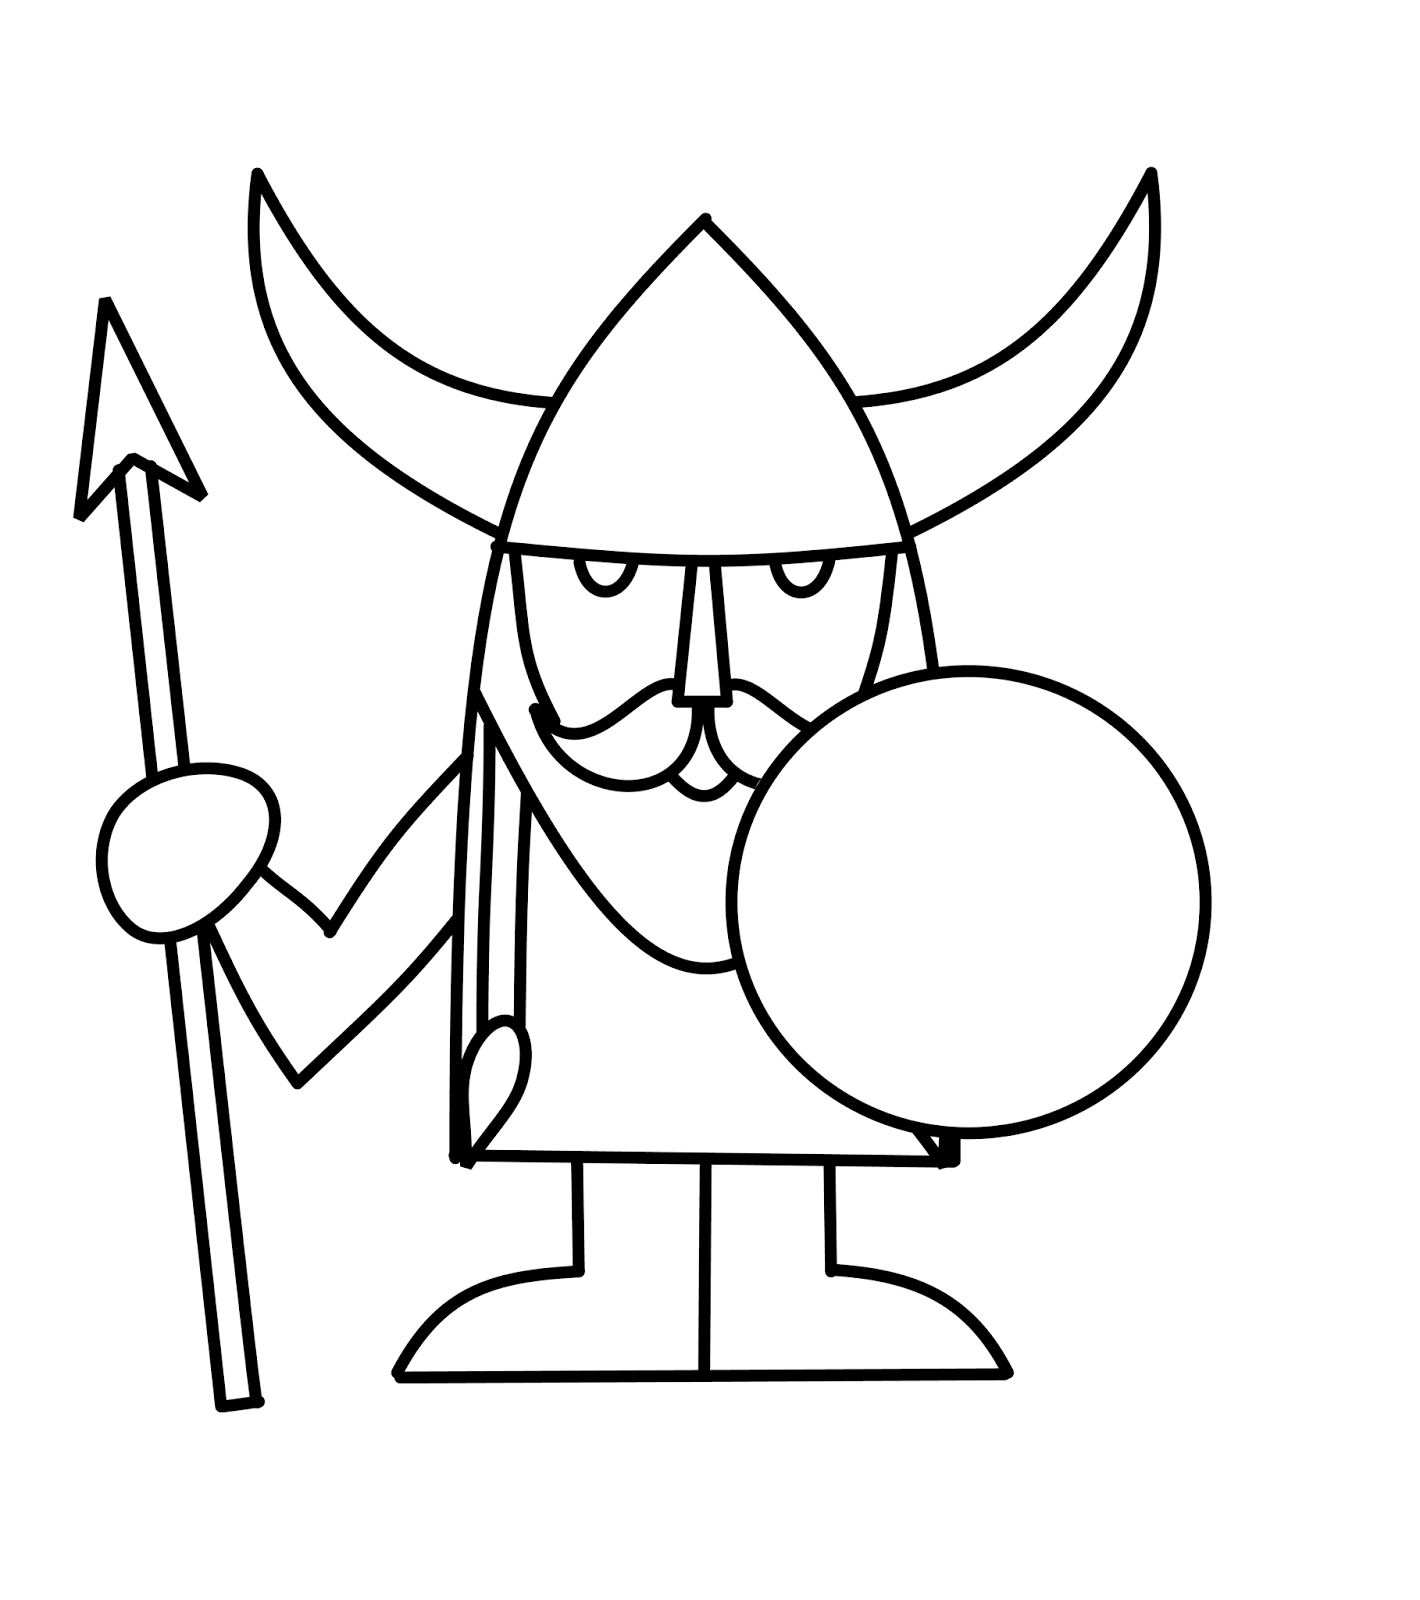 1420x1600 How To Draw Cartoons Viking